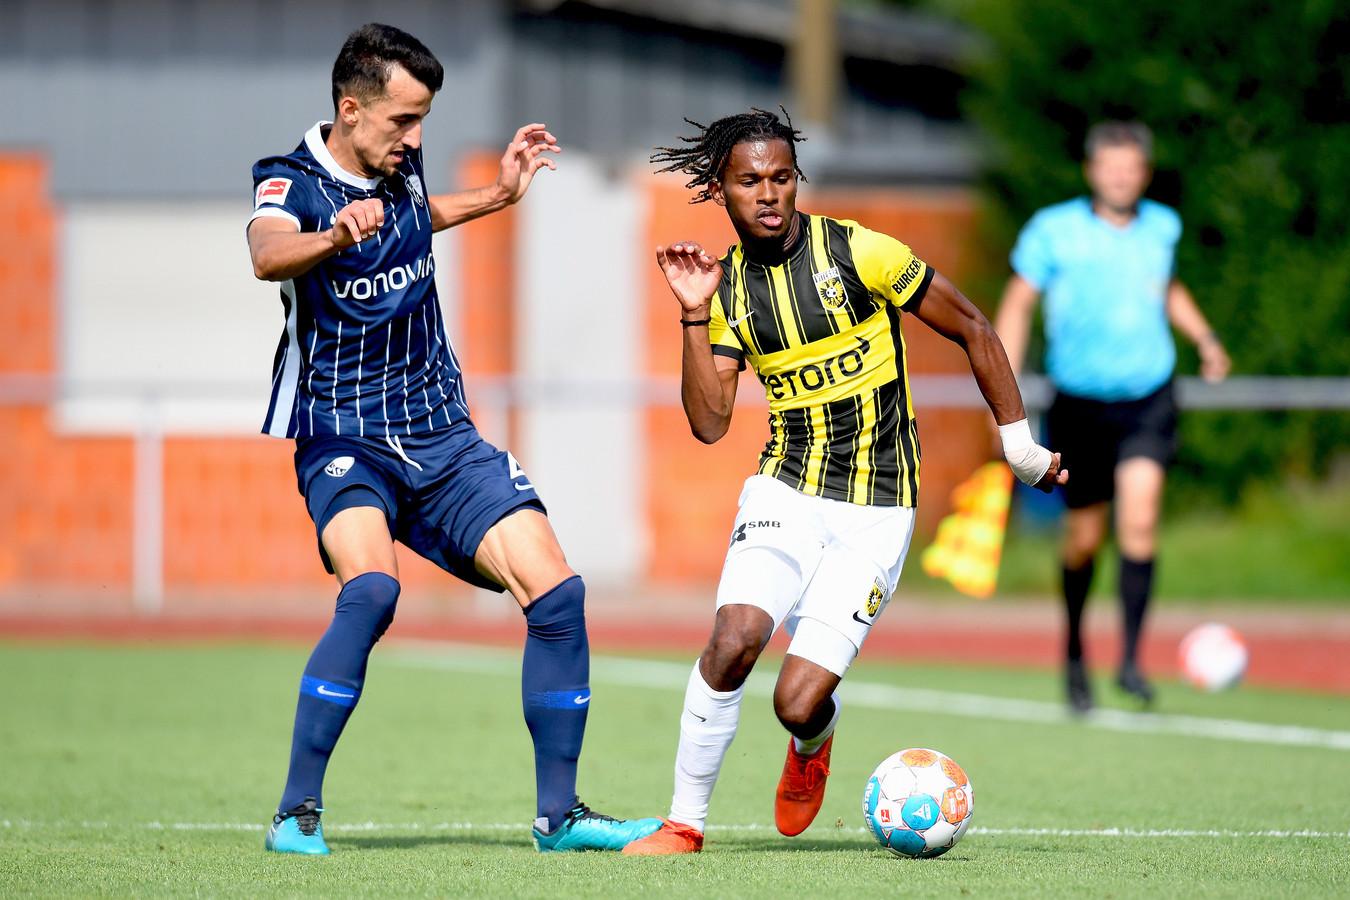 Vitesse-speler Yann Gbhoho (rechts) in duel met Saulo Decarli van VfL Bochum.